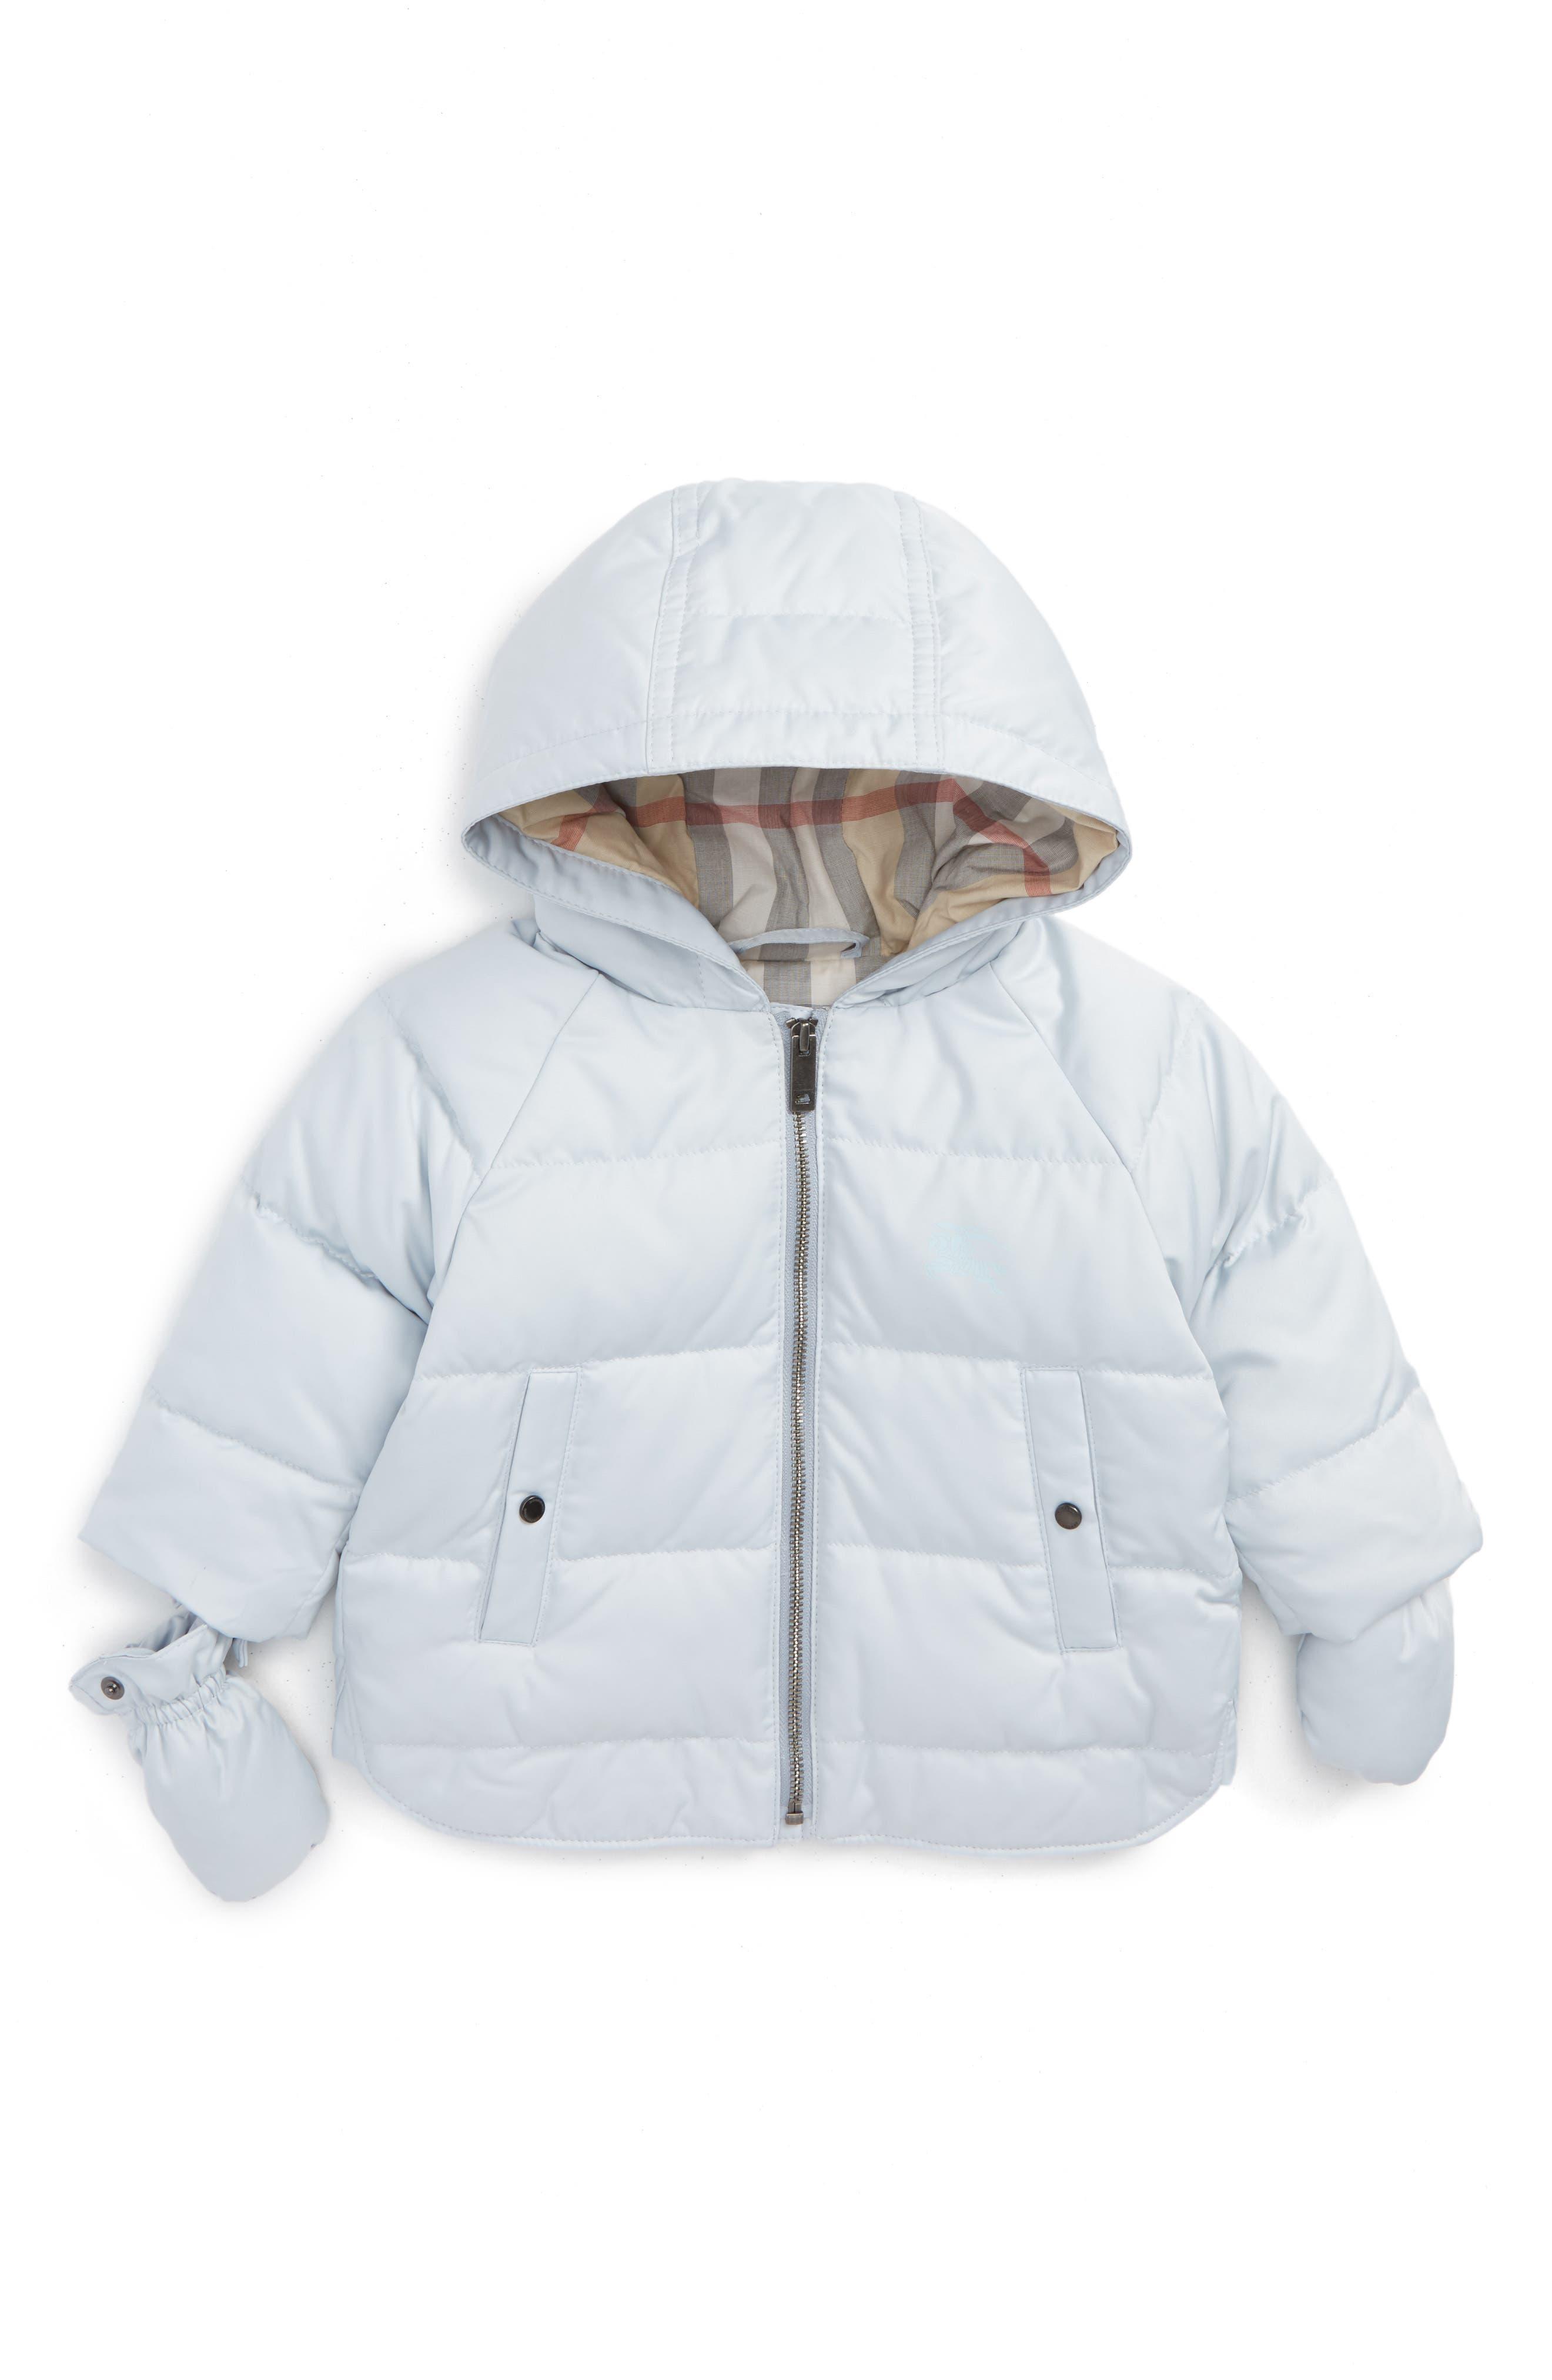 Main Image - Burberry Rilla Hooded Down Jacket (Baby)